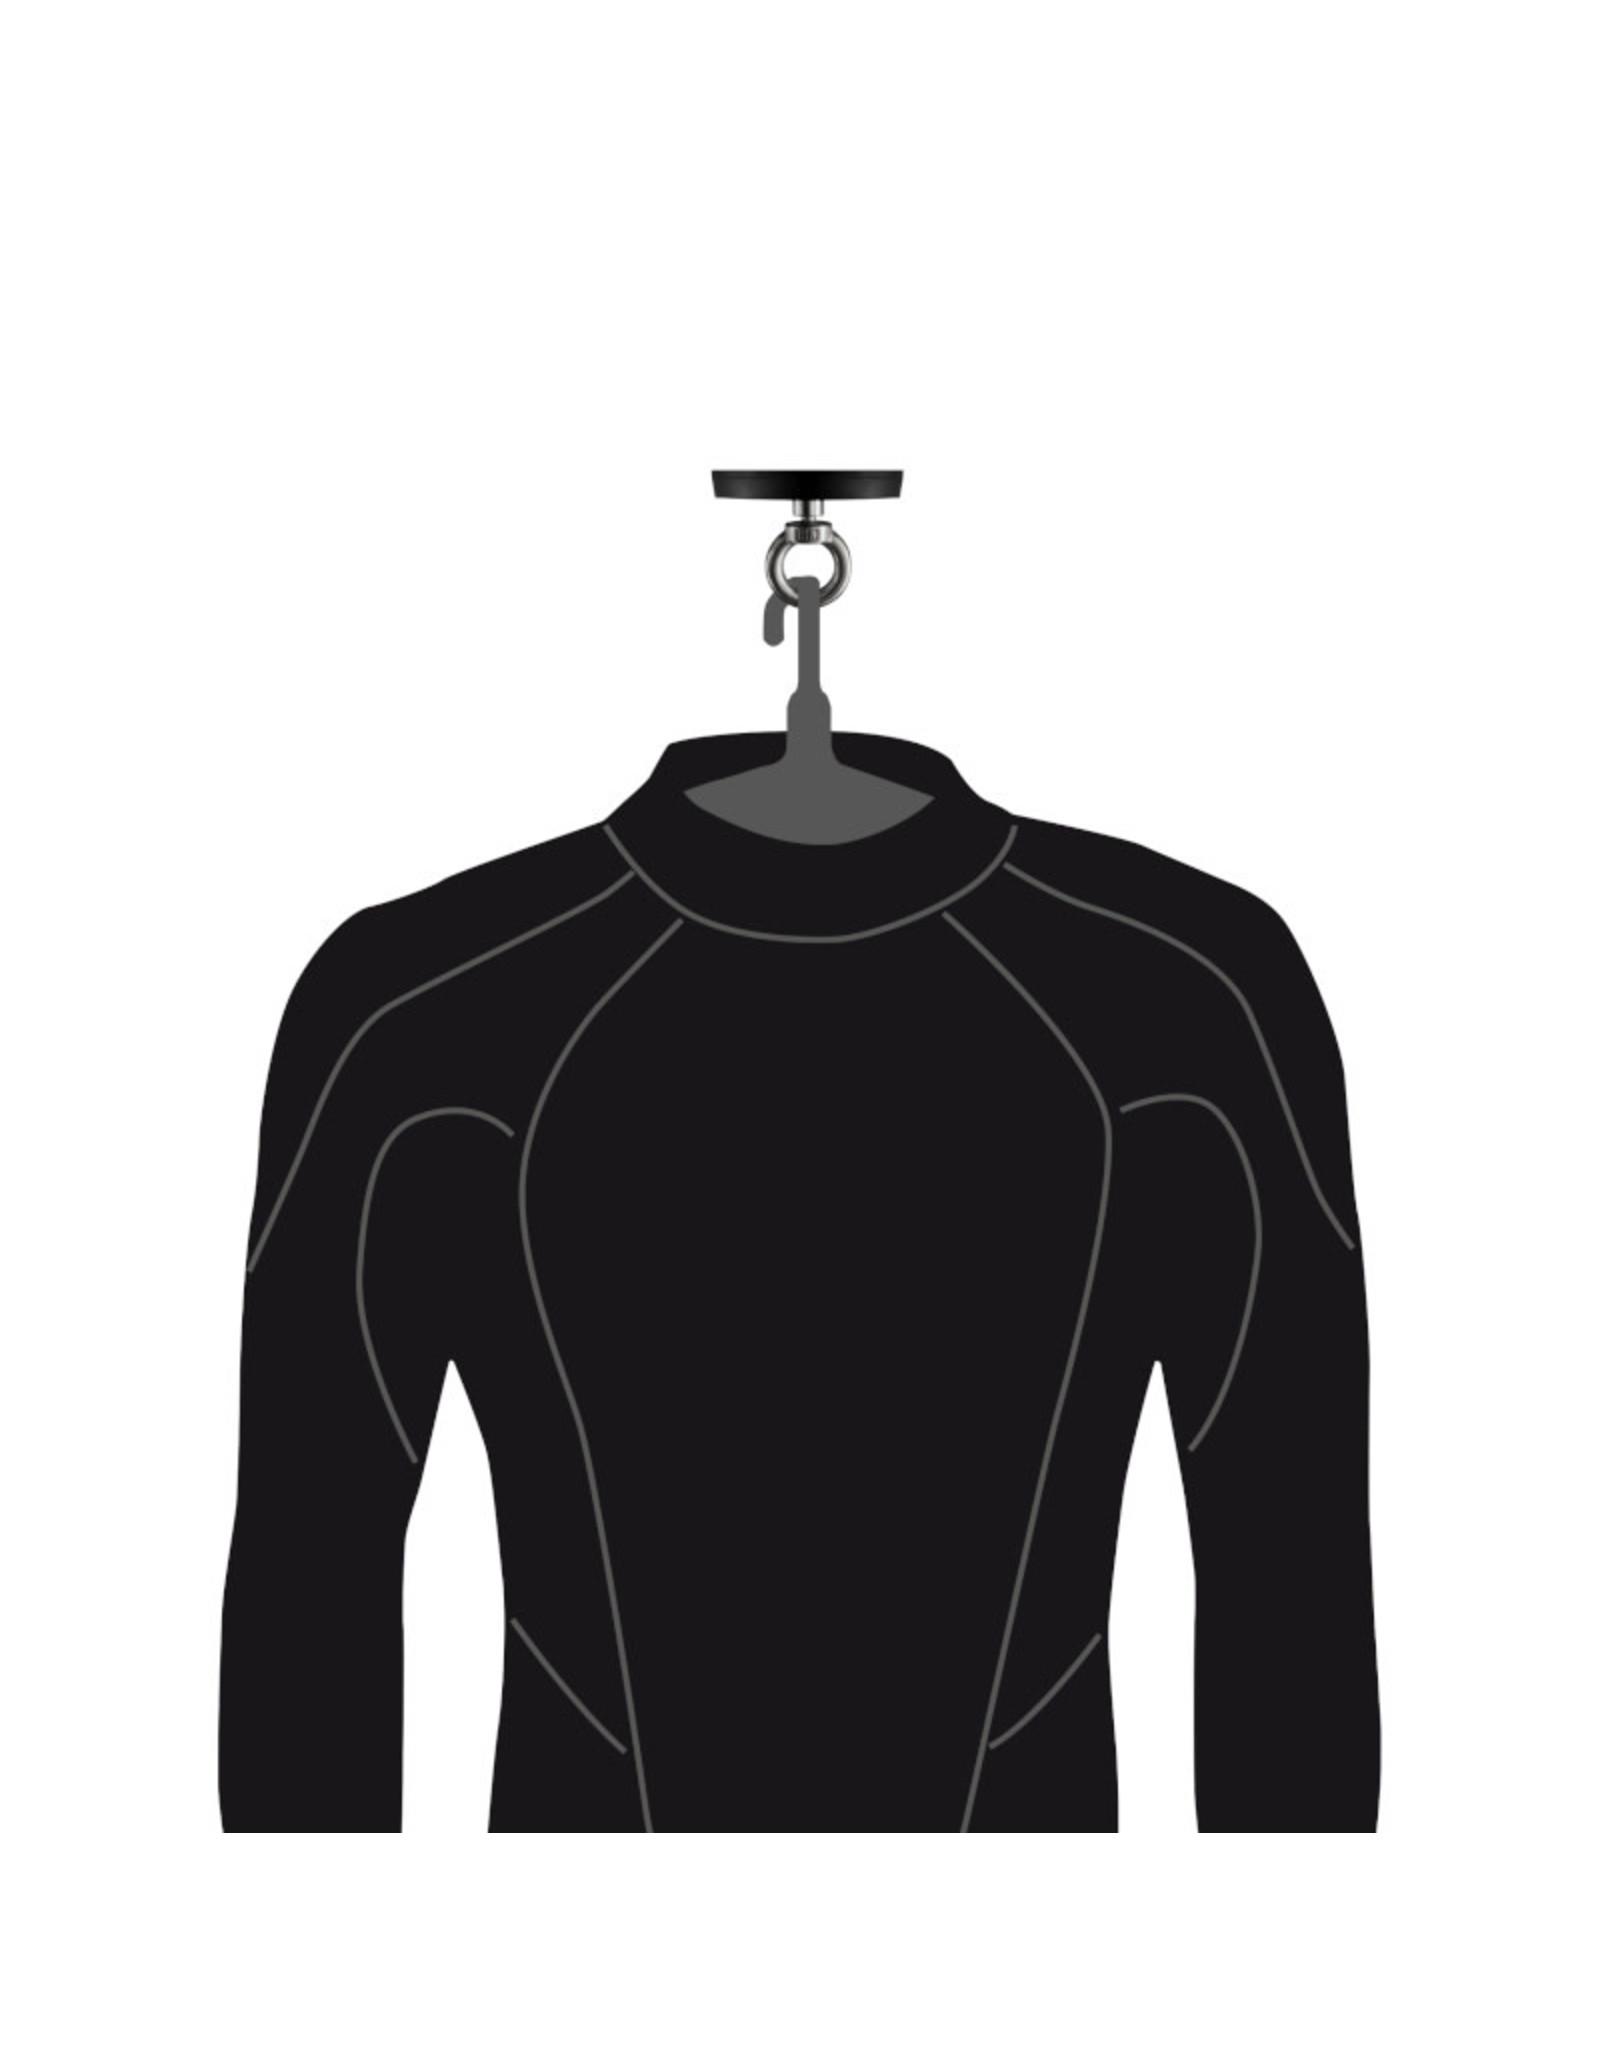 Surflogic Surflogic Magnetic Wetsuit Hook